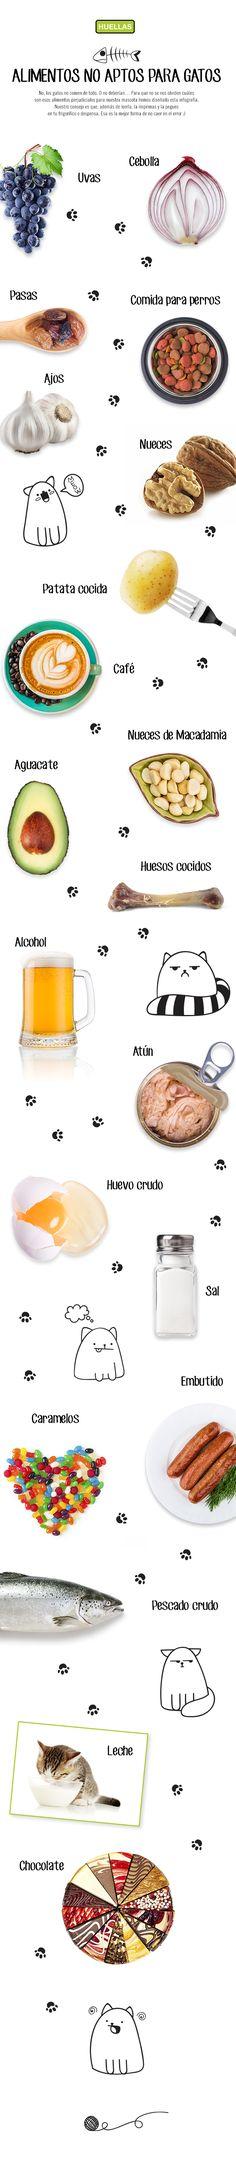 Alimentos no aptos para gatos (no tenia idea de que no podian tomar leche, creo q envenene a mis gatitos sin querer. Jeje